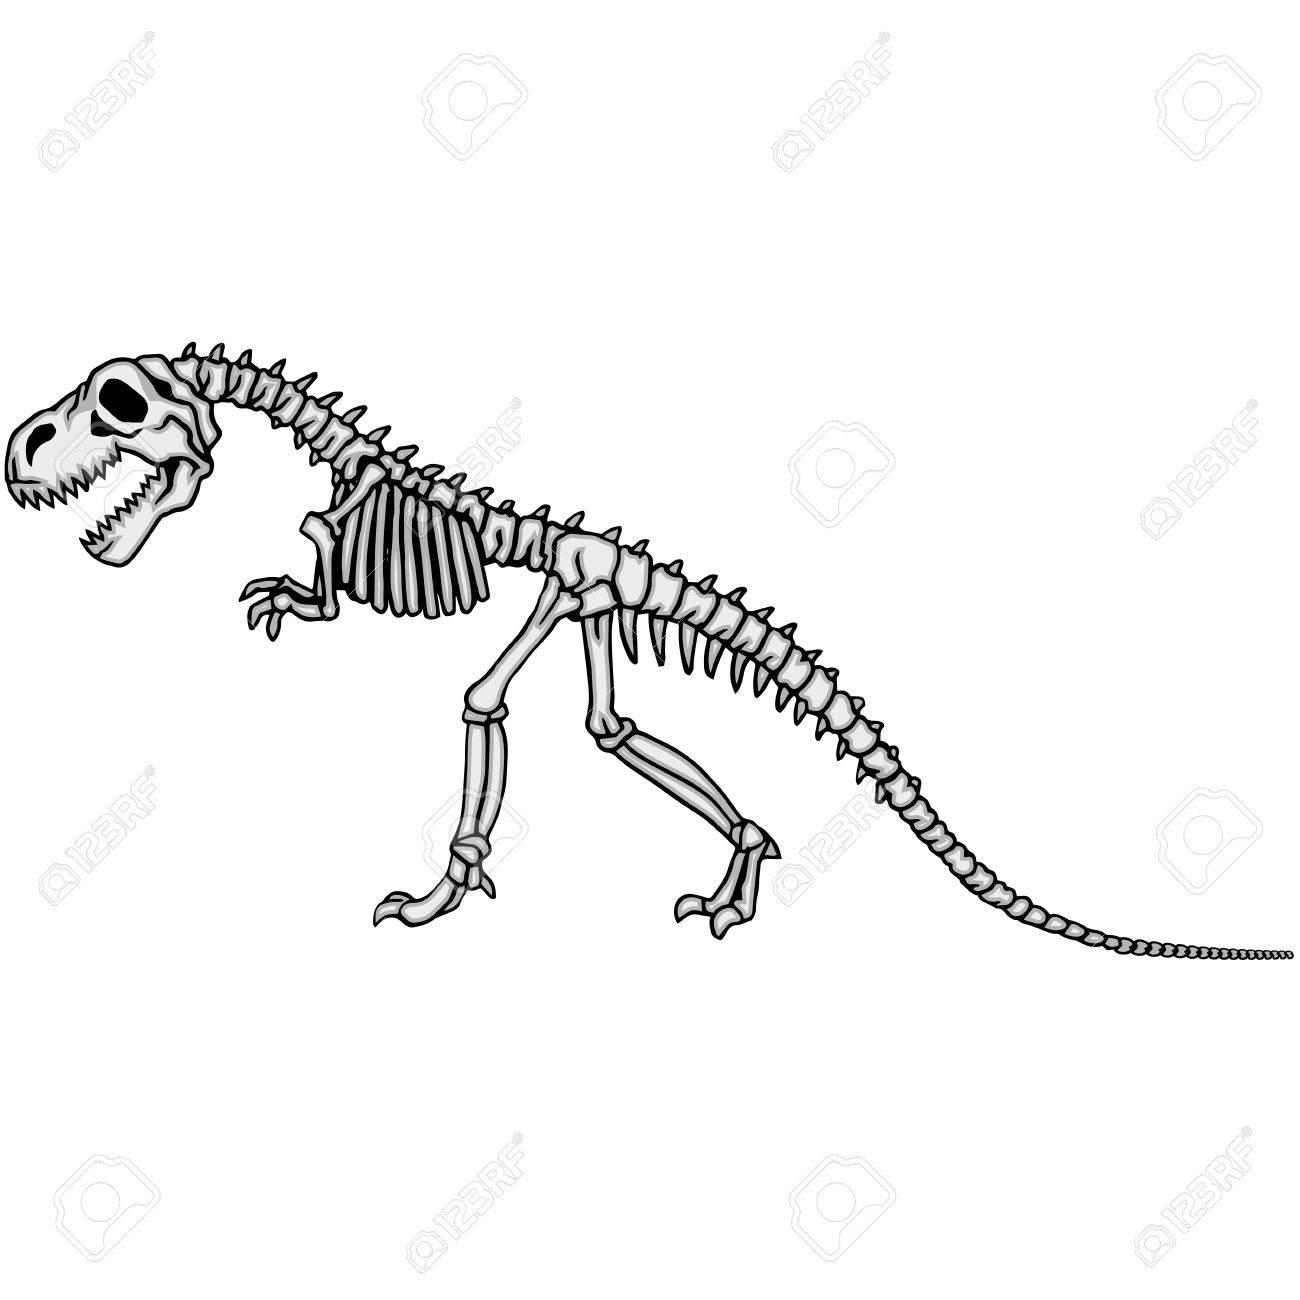 1300x1300 Dinosaur Skeleton Royalty Free Cliparts, Vectors, And Stock